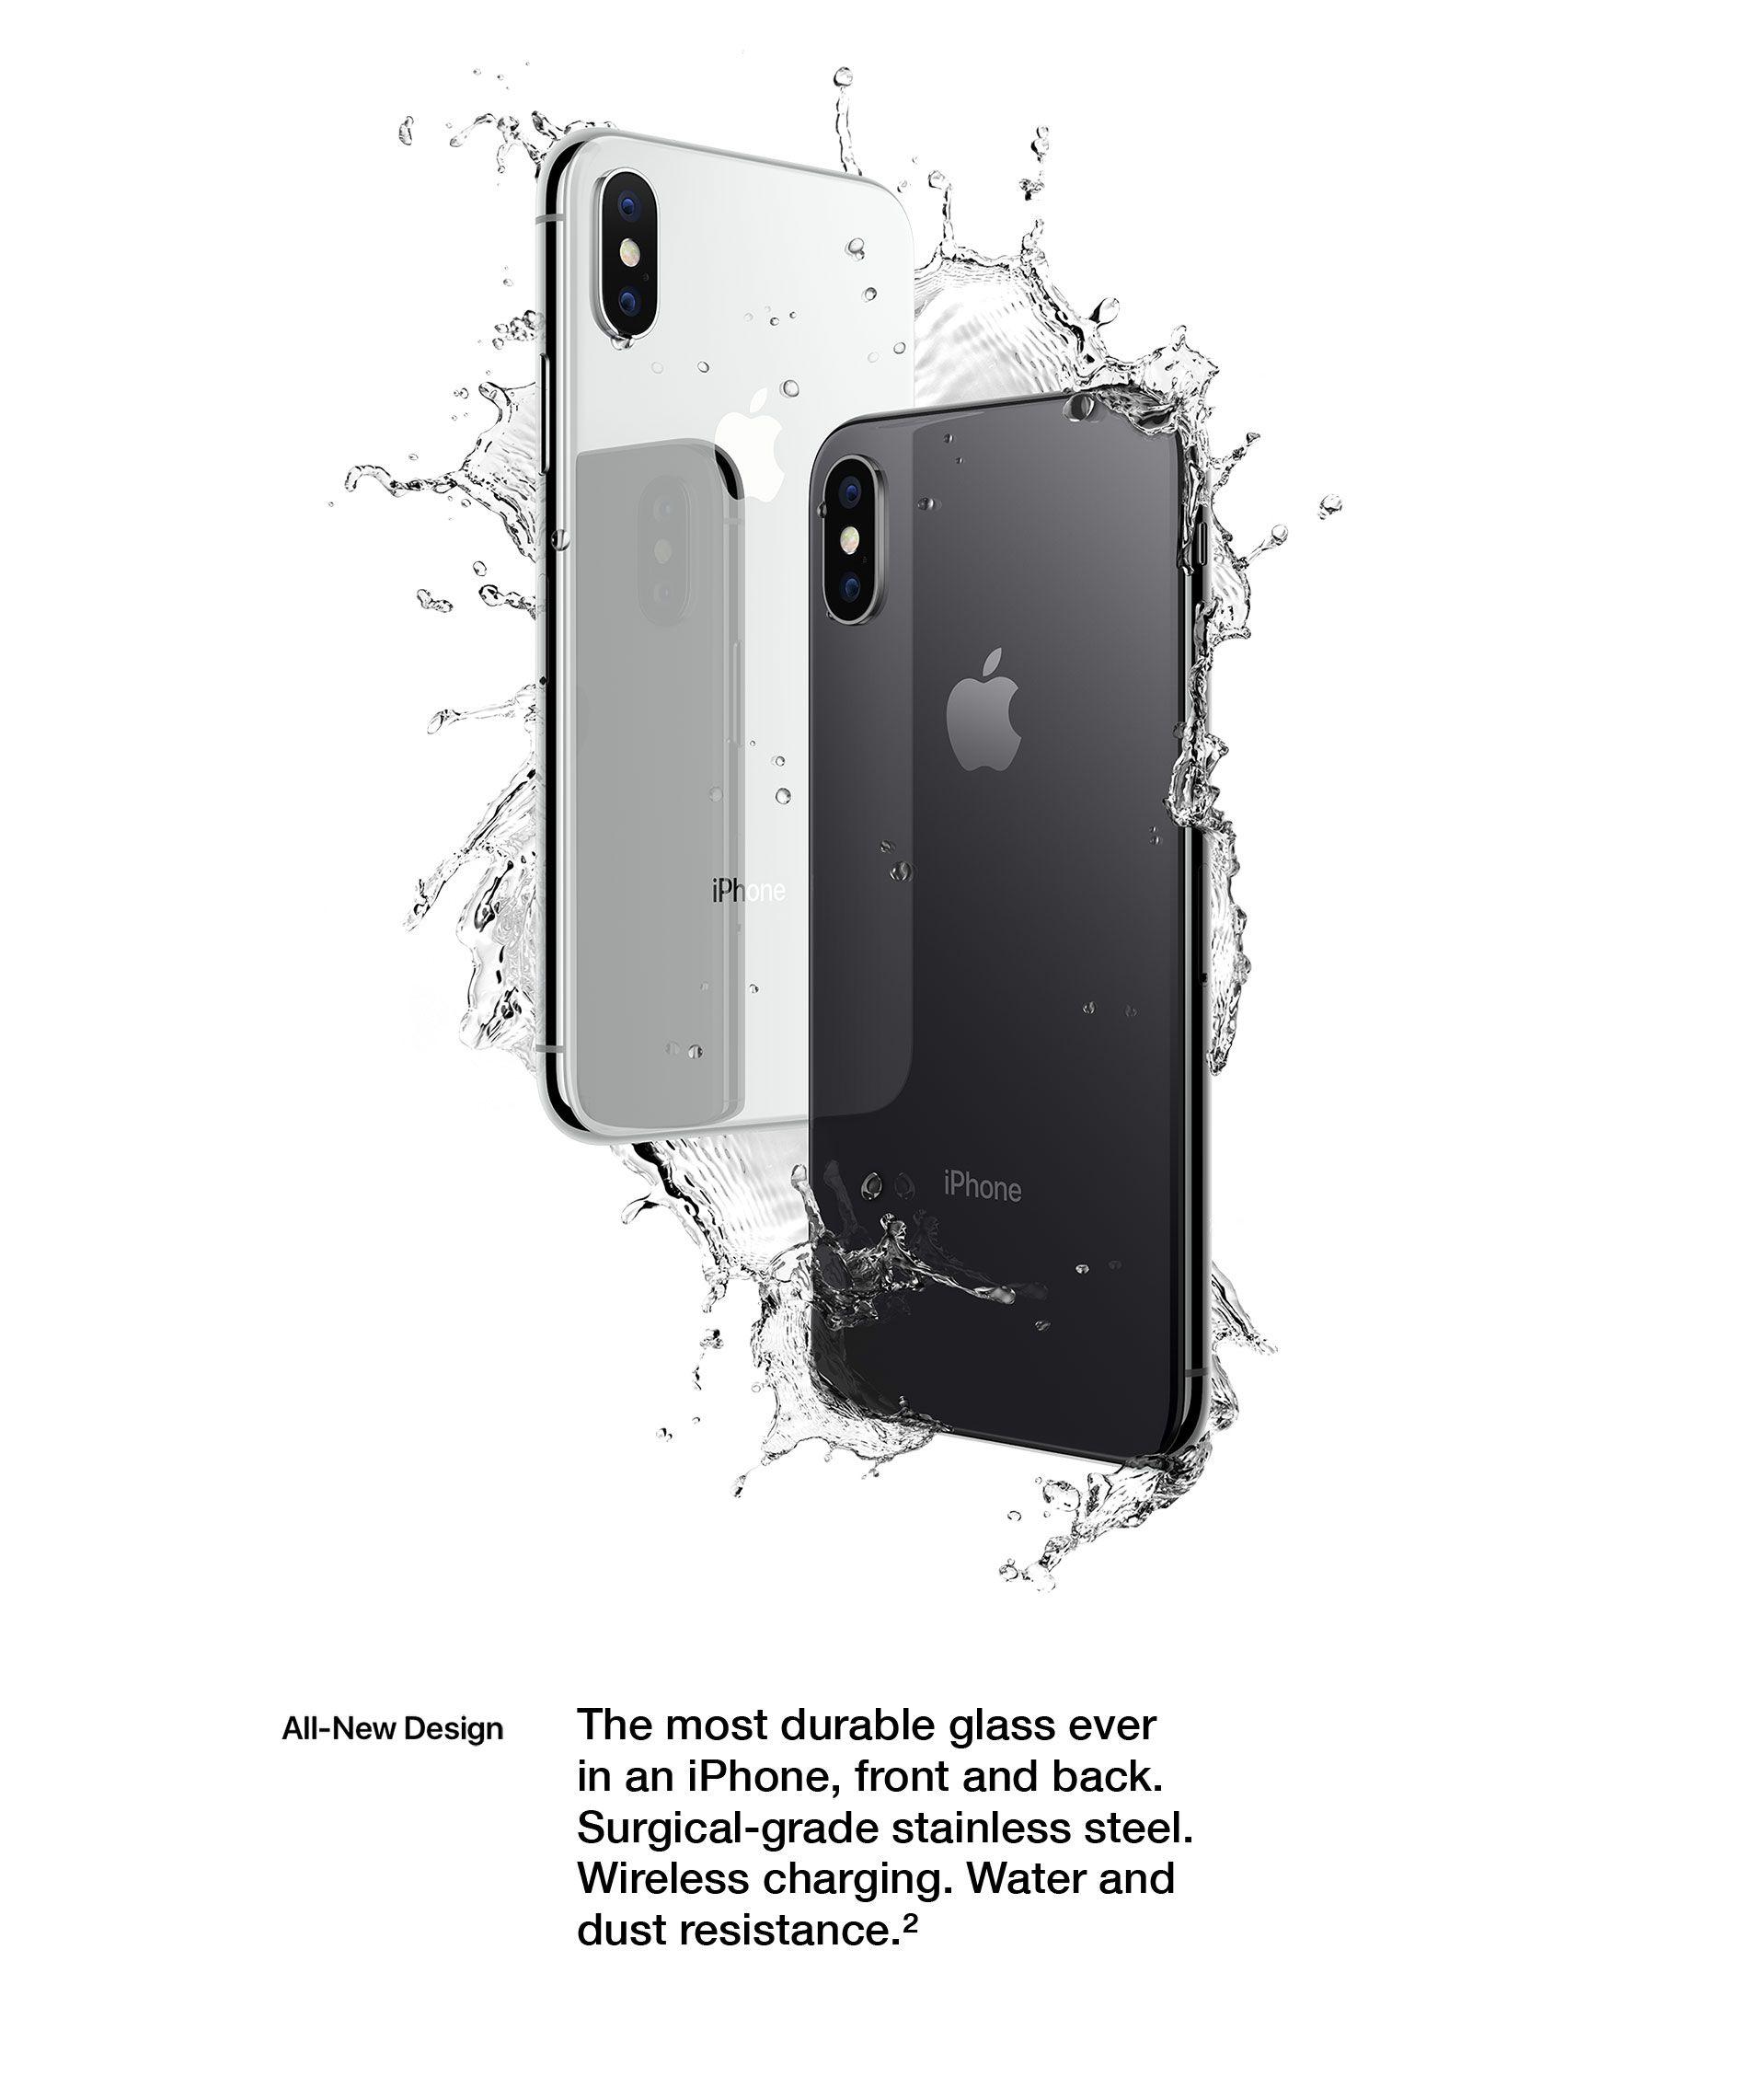 All-New Design